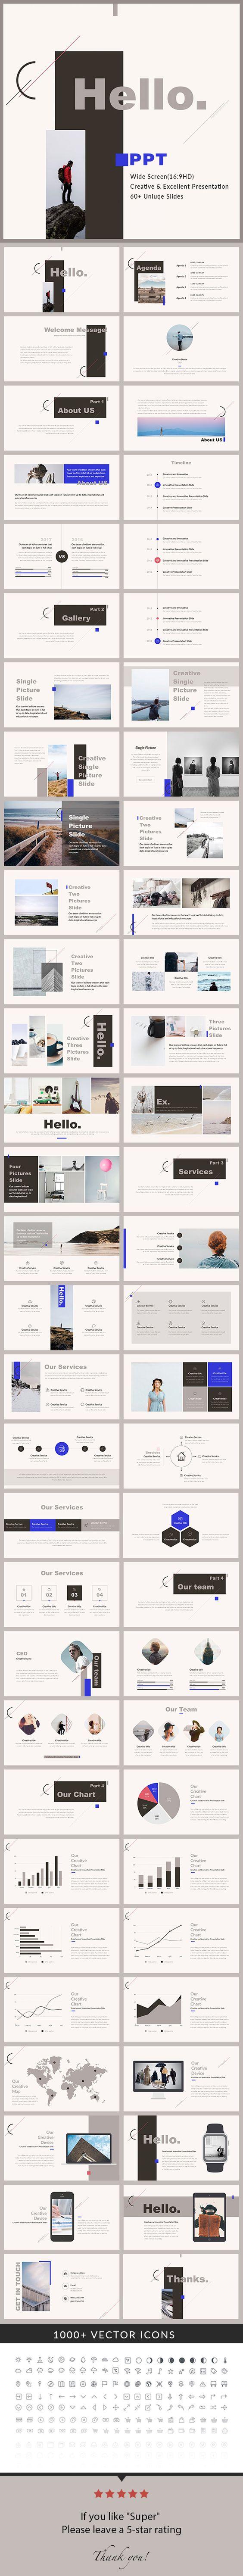 Hello - PowerPoint Presentation Template - Creative PowerPoint Templates